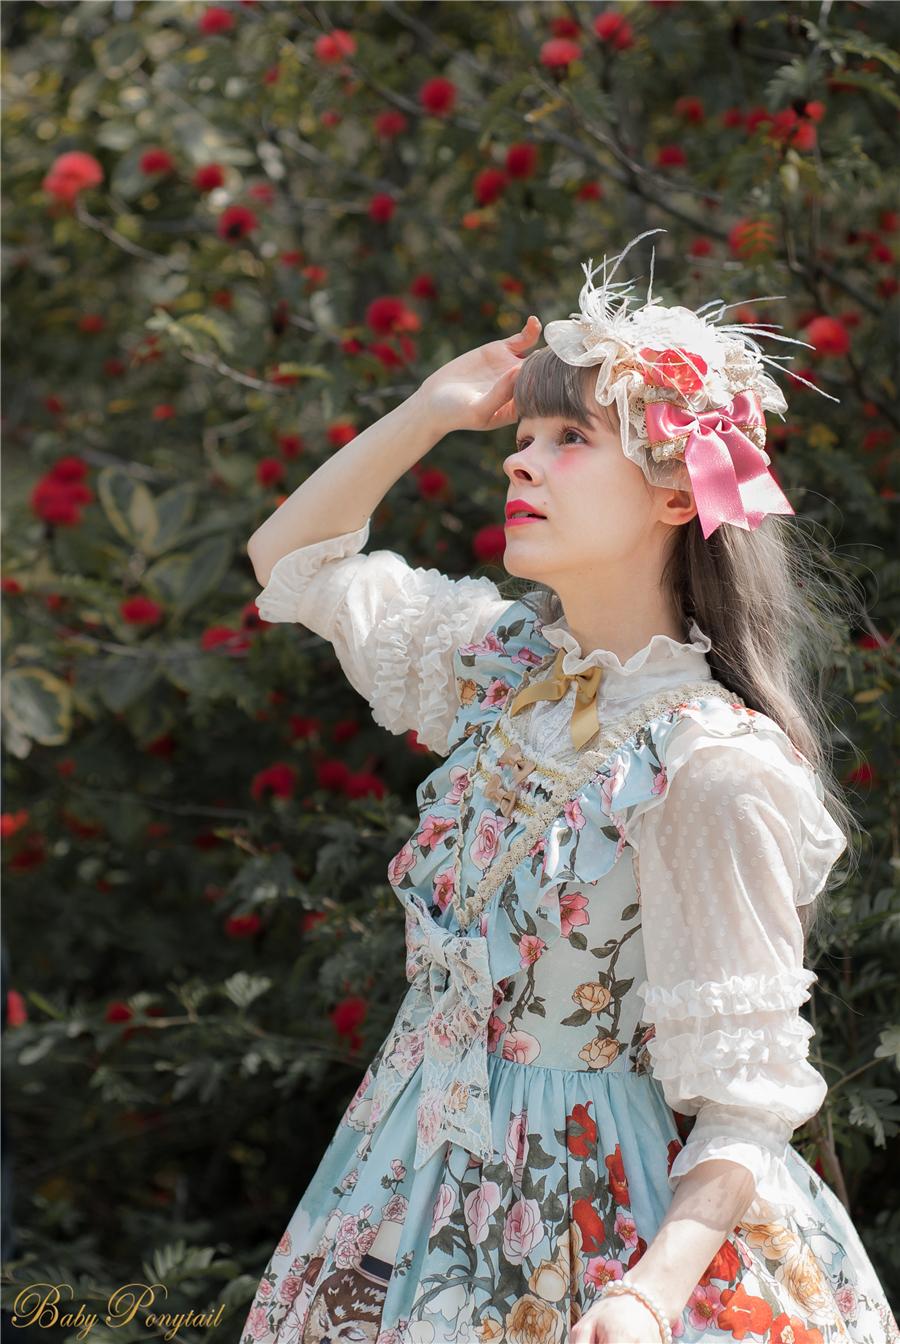 Baby Ponytail_Model Photo_Polly's Garden of Dreams_JSK Sky_Claudia07.jpg